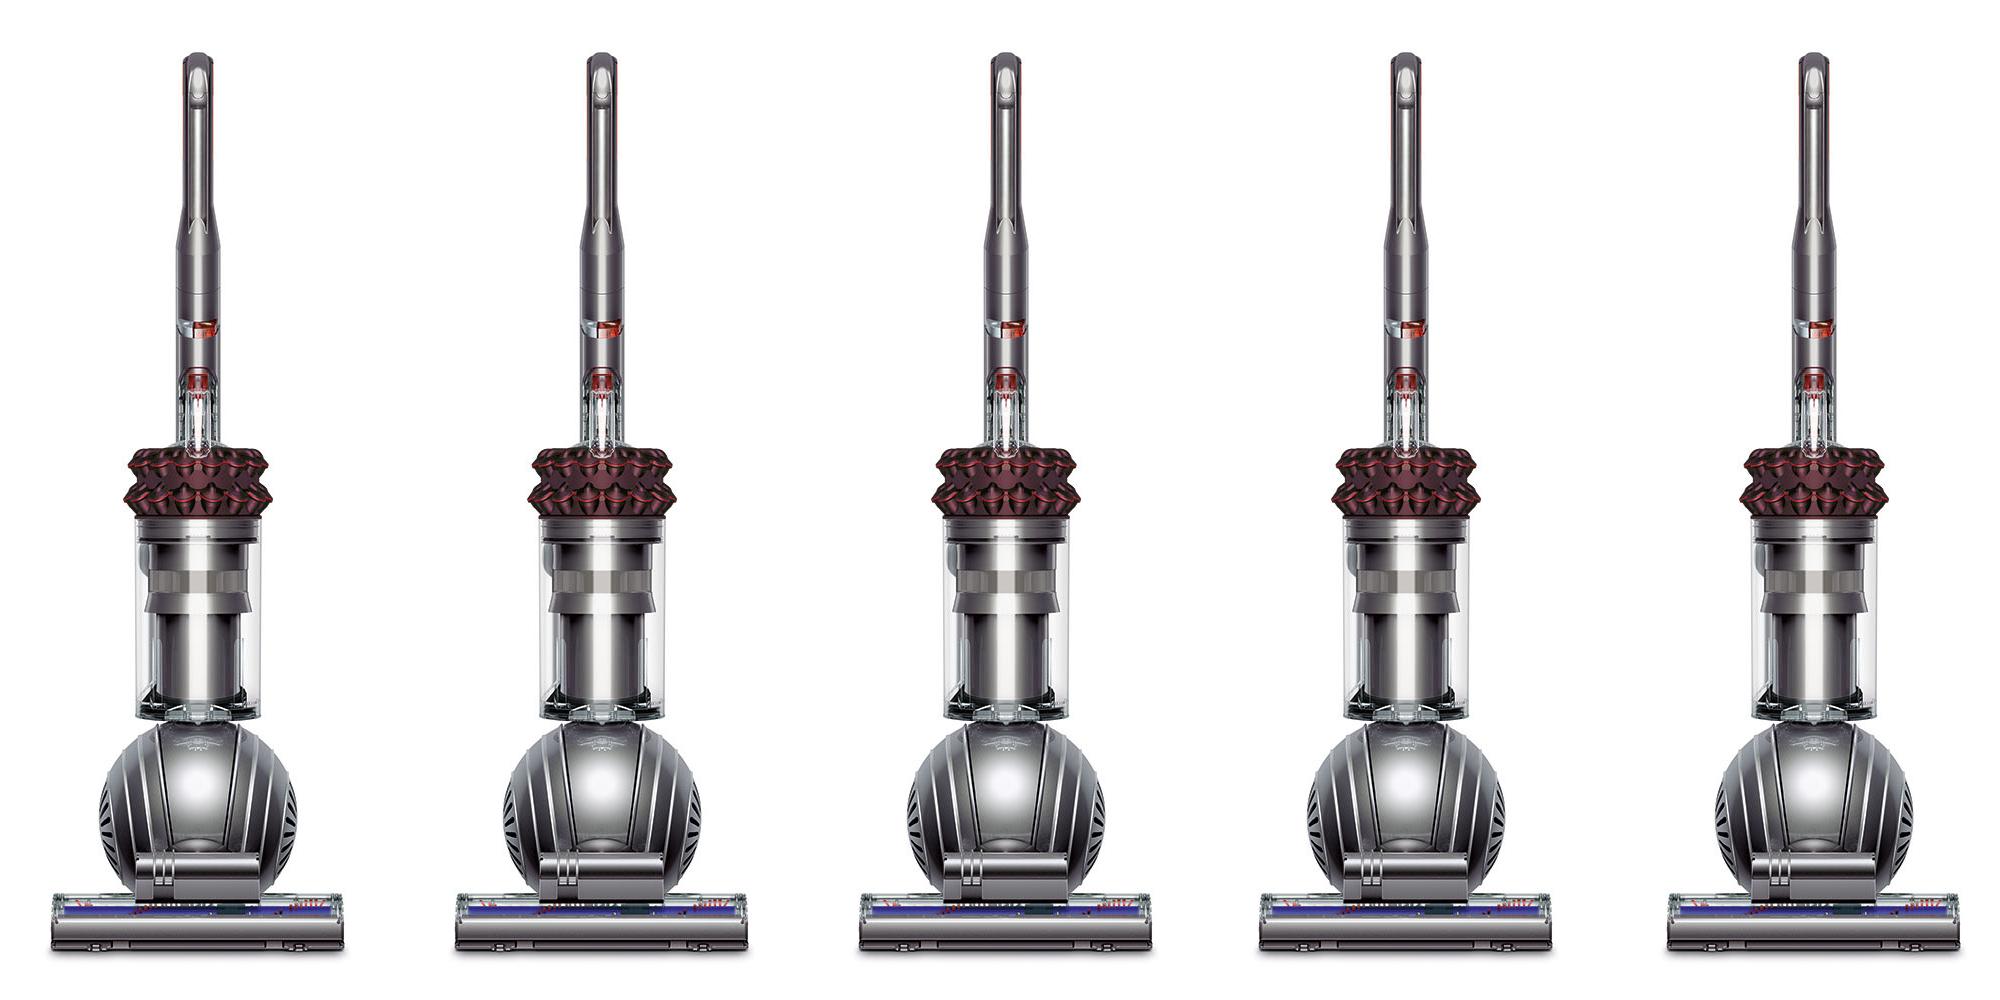 Dyson Big Ball Multi Floor Pro Upright Vac For 250